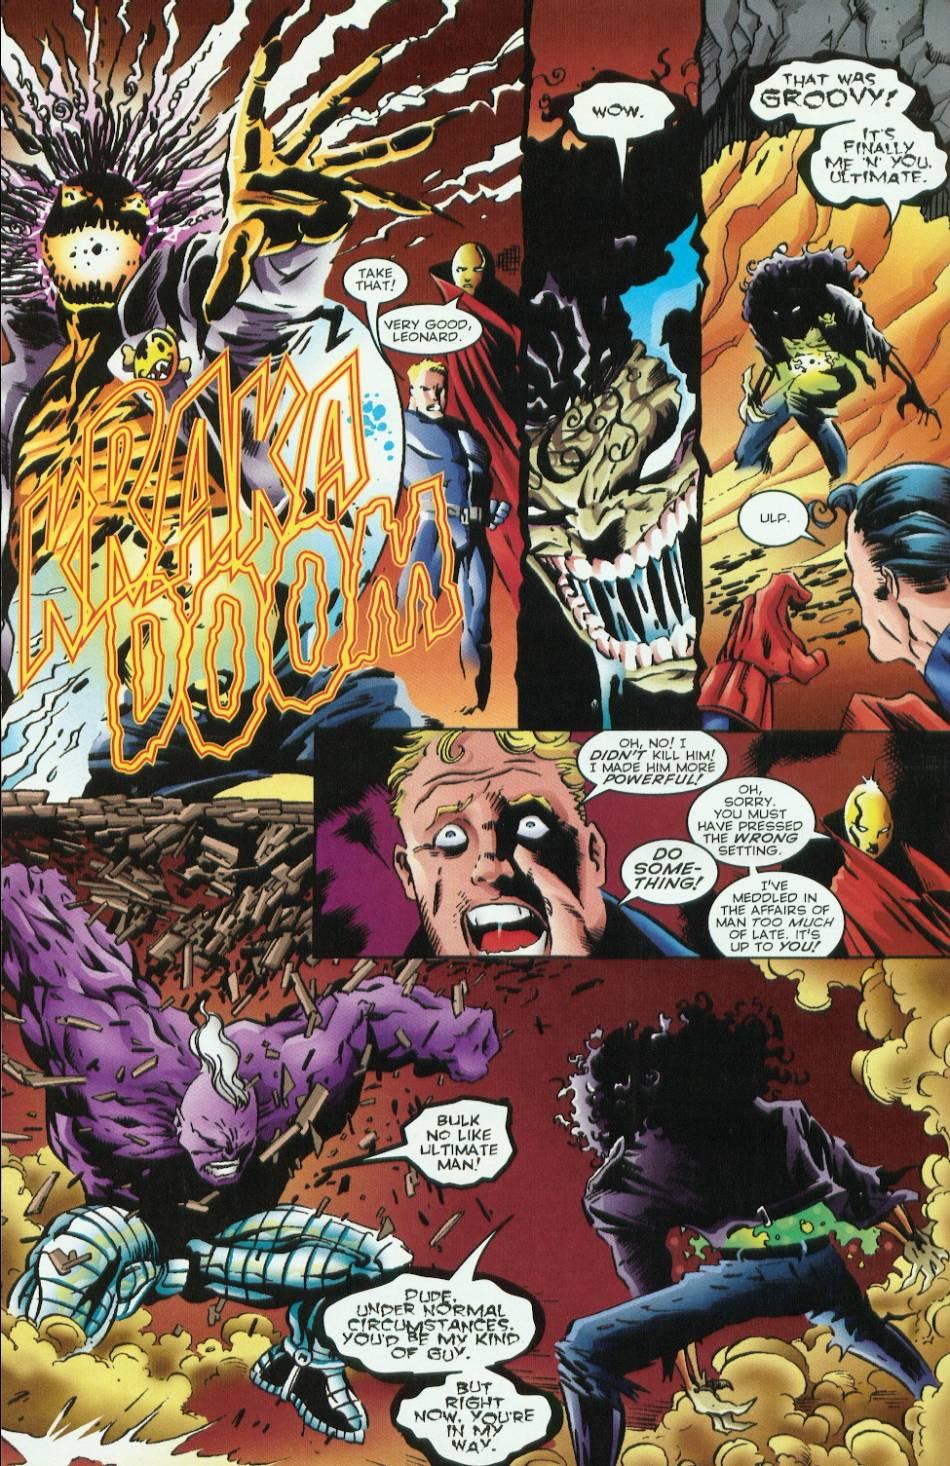 Read online Evil Ernie vs. the Superheroes comic -  Issue #1 - 26